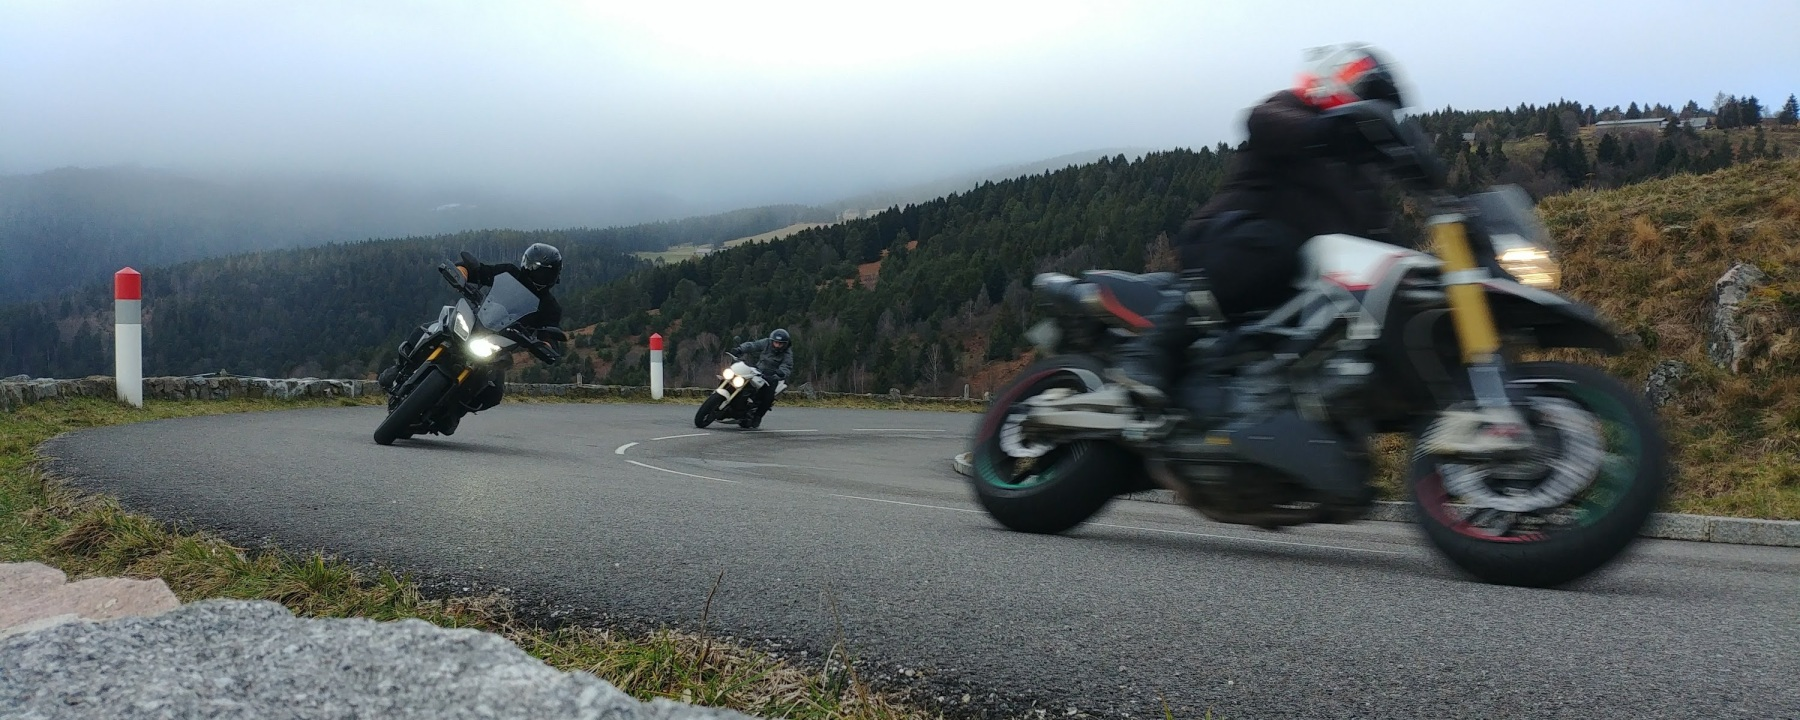 Photo ITBR groupe moto Street triple tracer dorsoduro